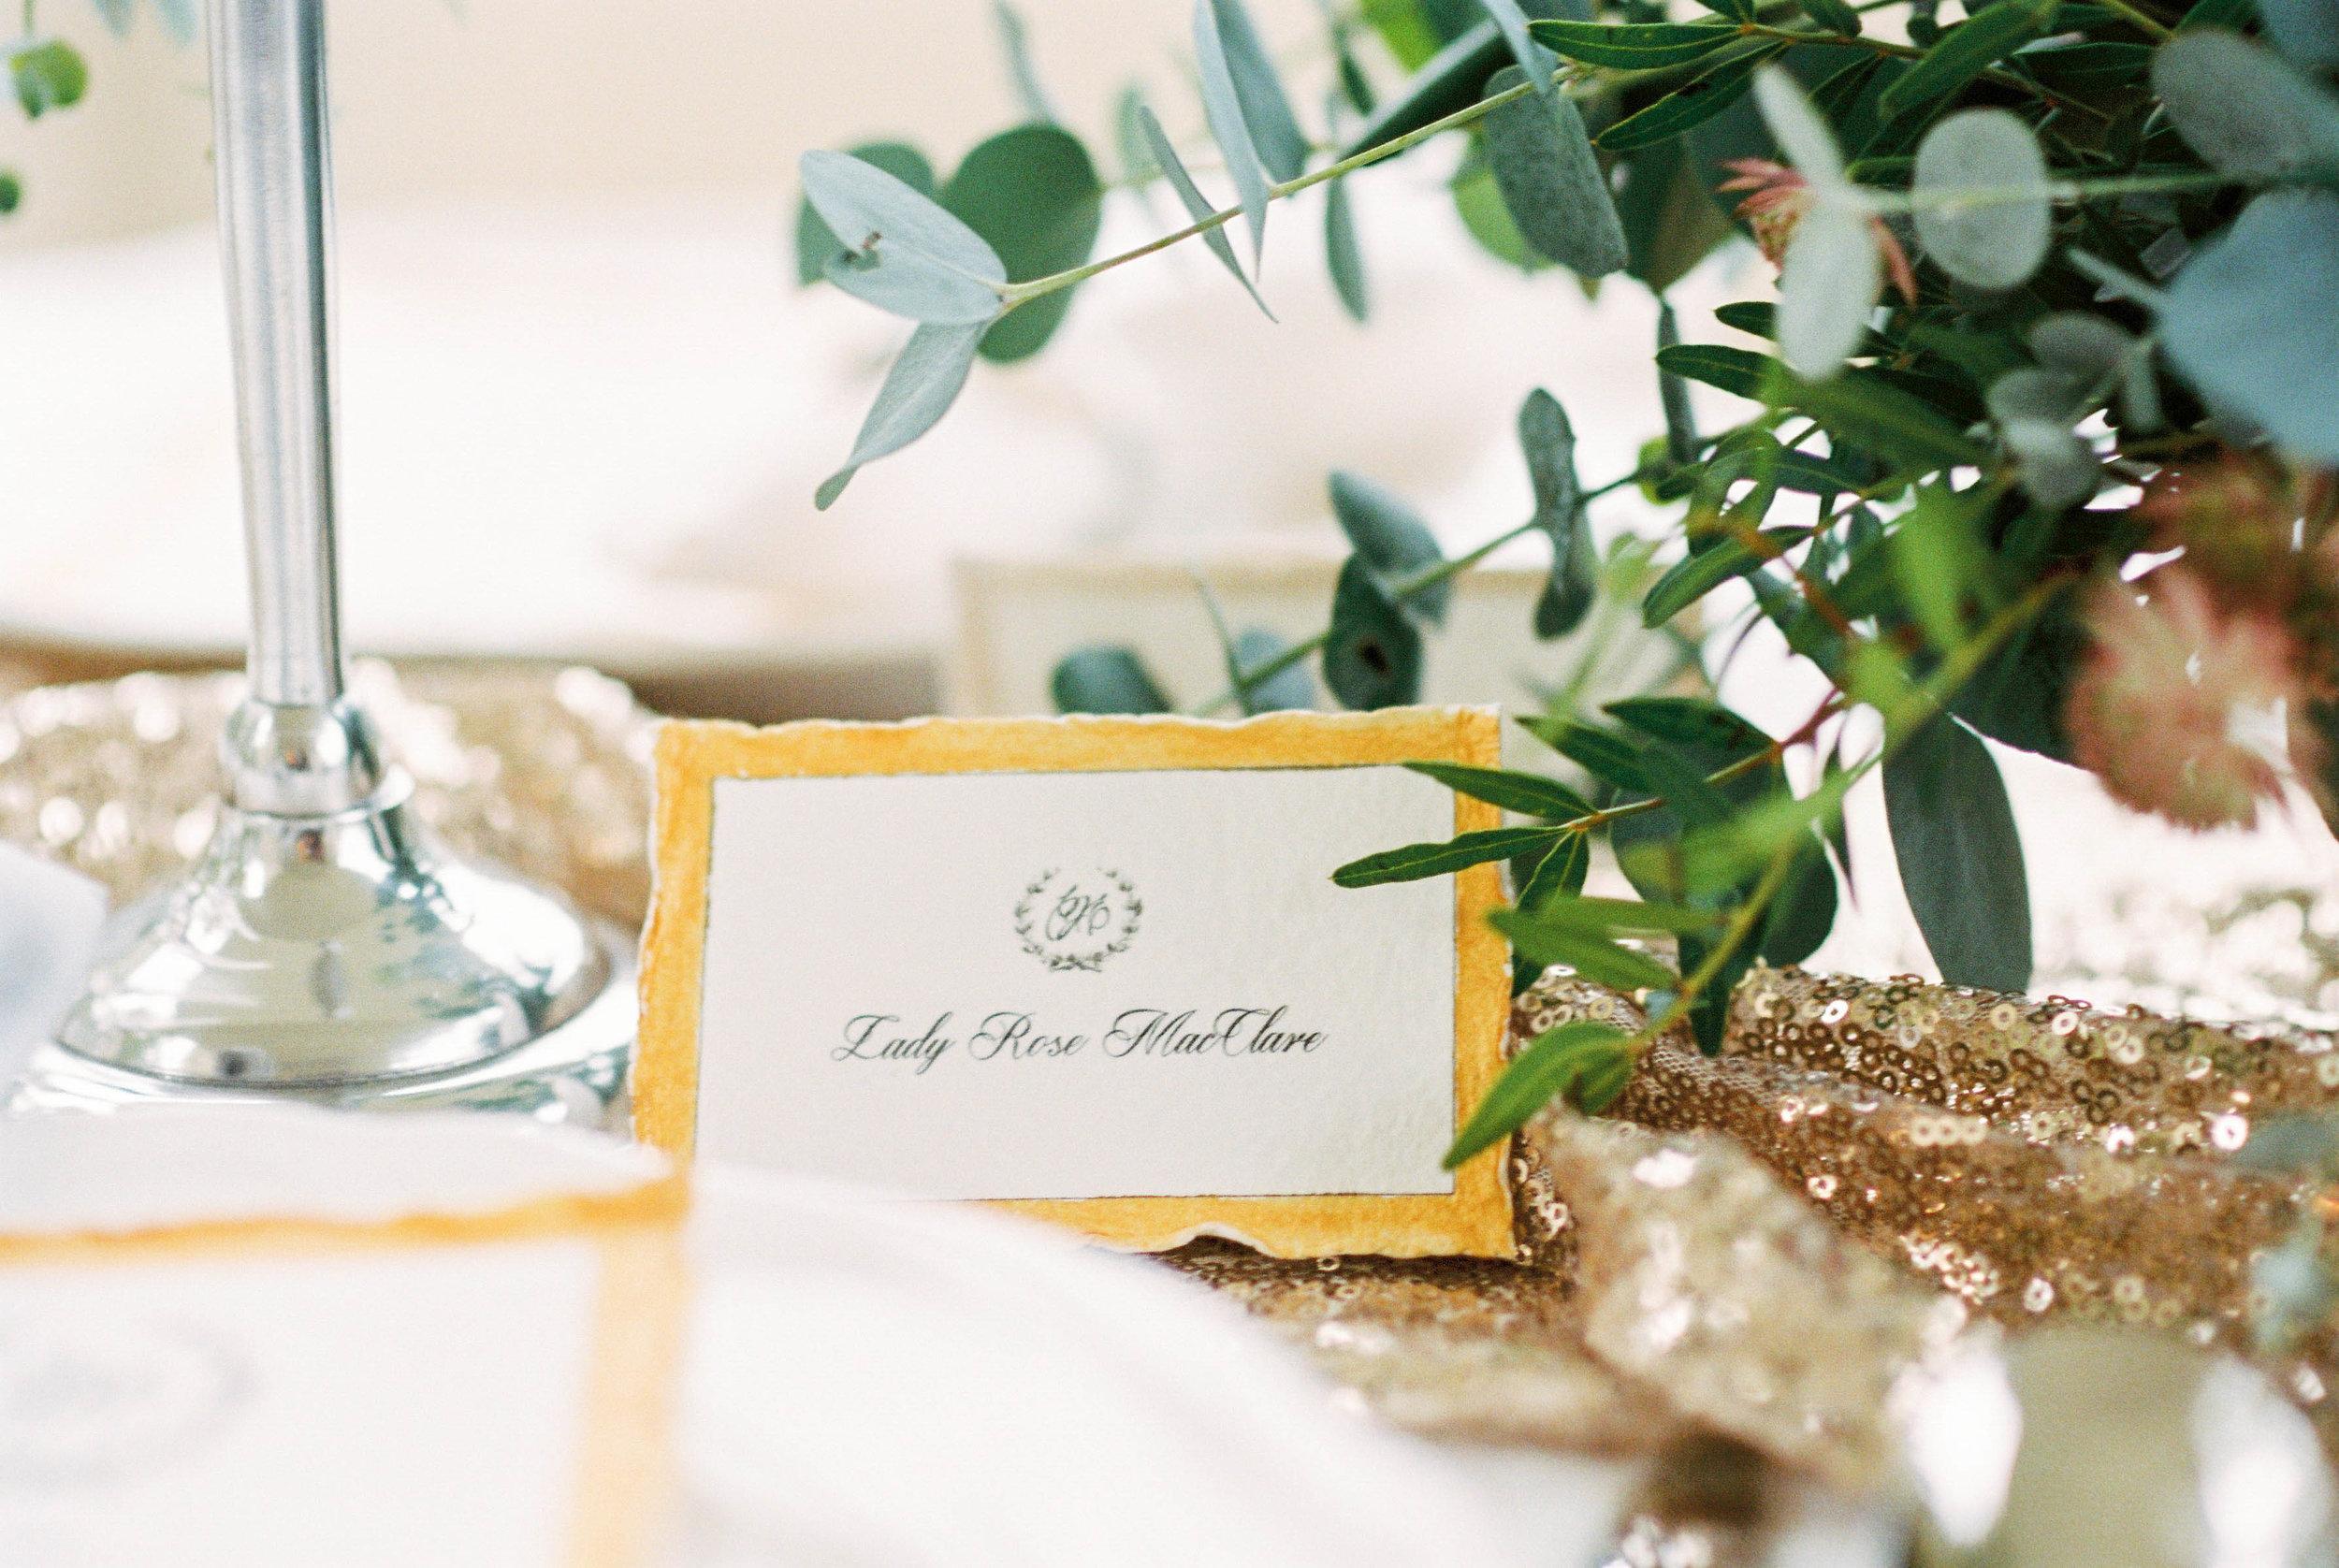 eskuvo-nevkartya-toboz-muvek-asztal-dekoracio-virag-asztaldisz.jpg